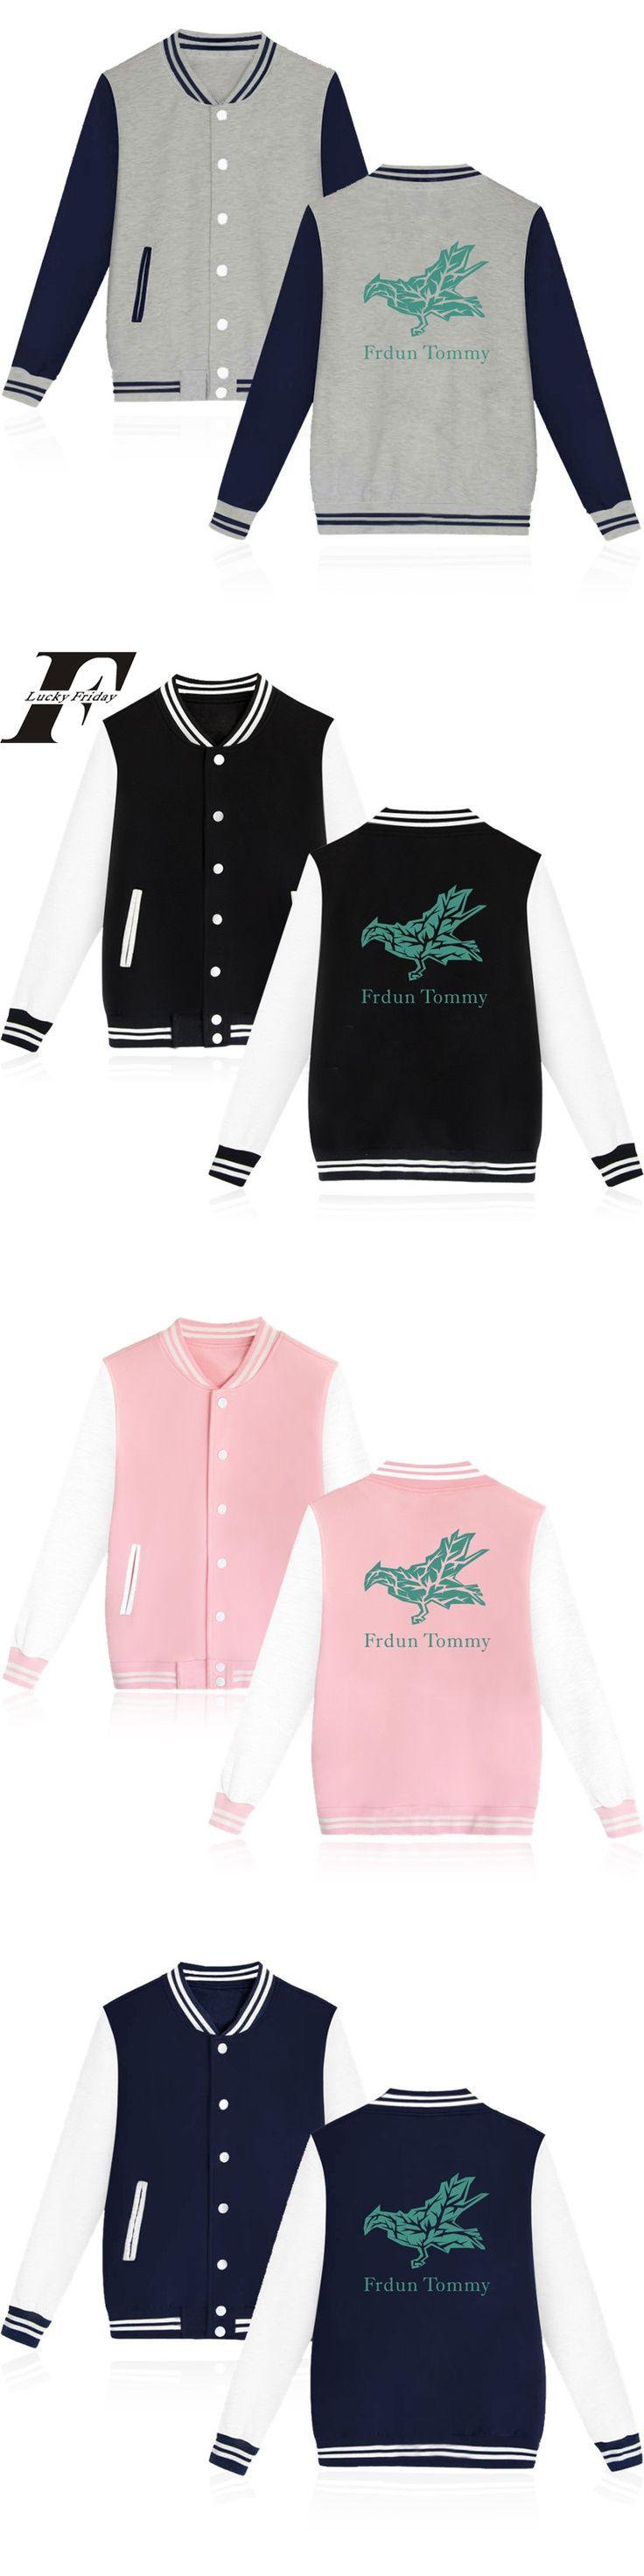 winter jacket men bomber jacket Baseball Jackets men Cotton fitness softshell jacket Plus Size Sweatshirt